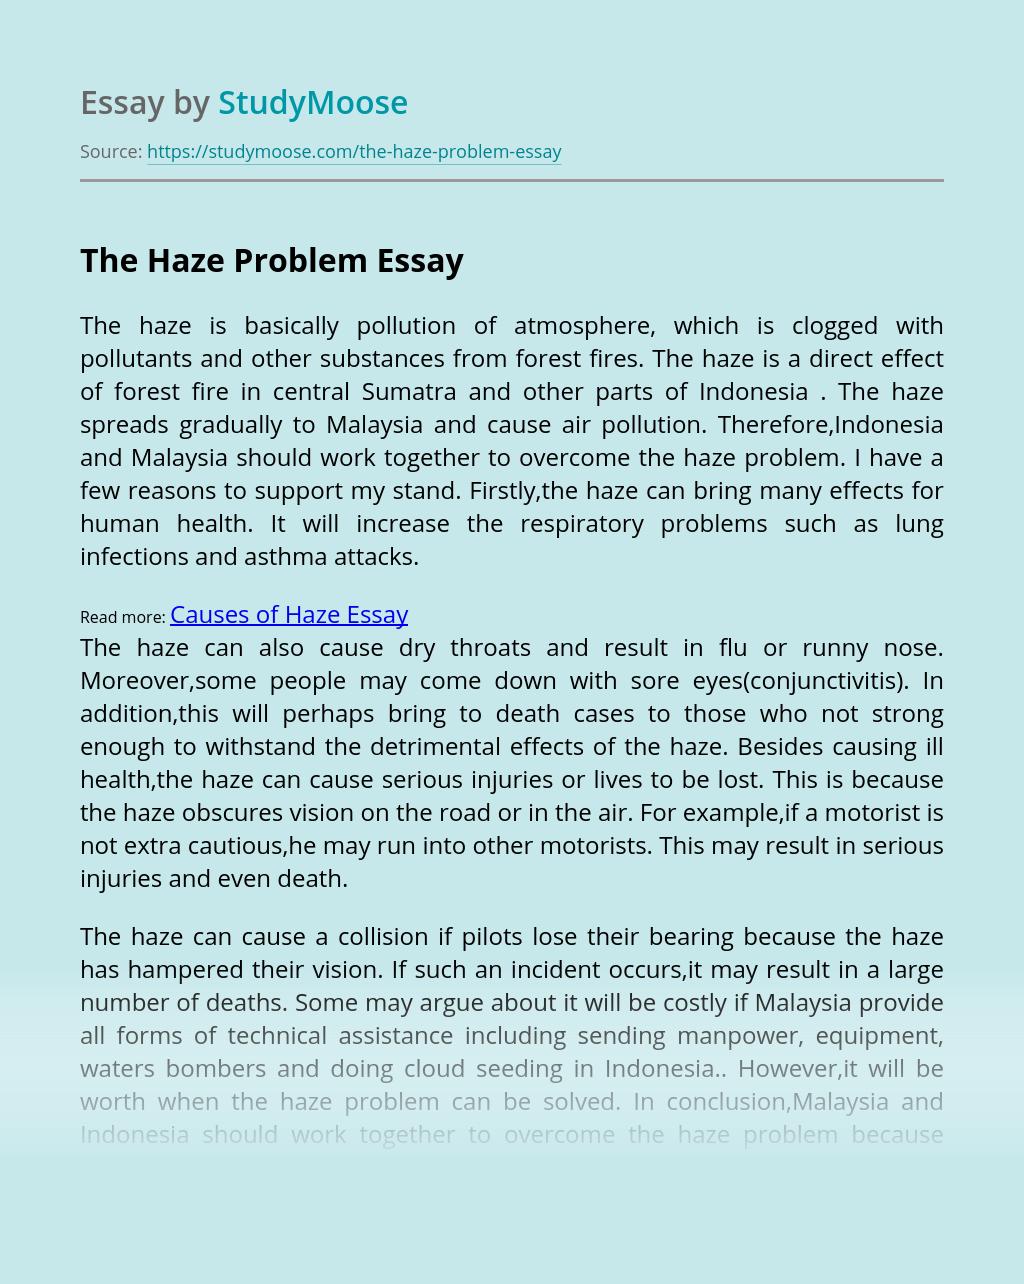 The Haze Problem